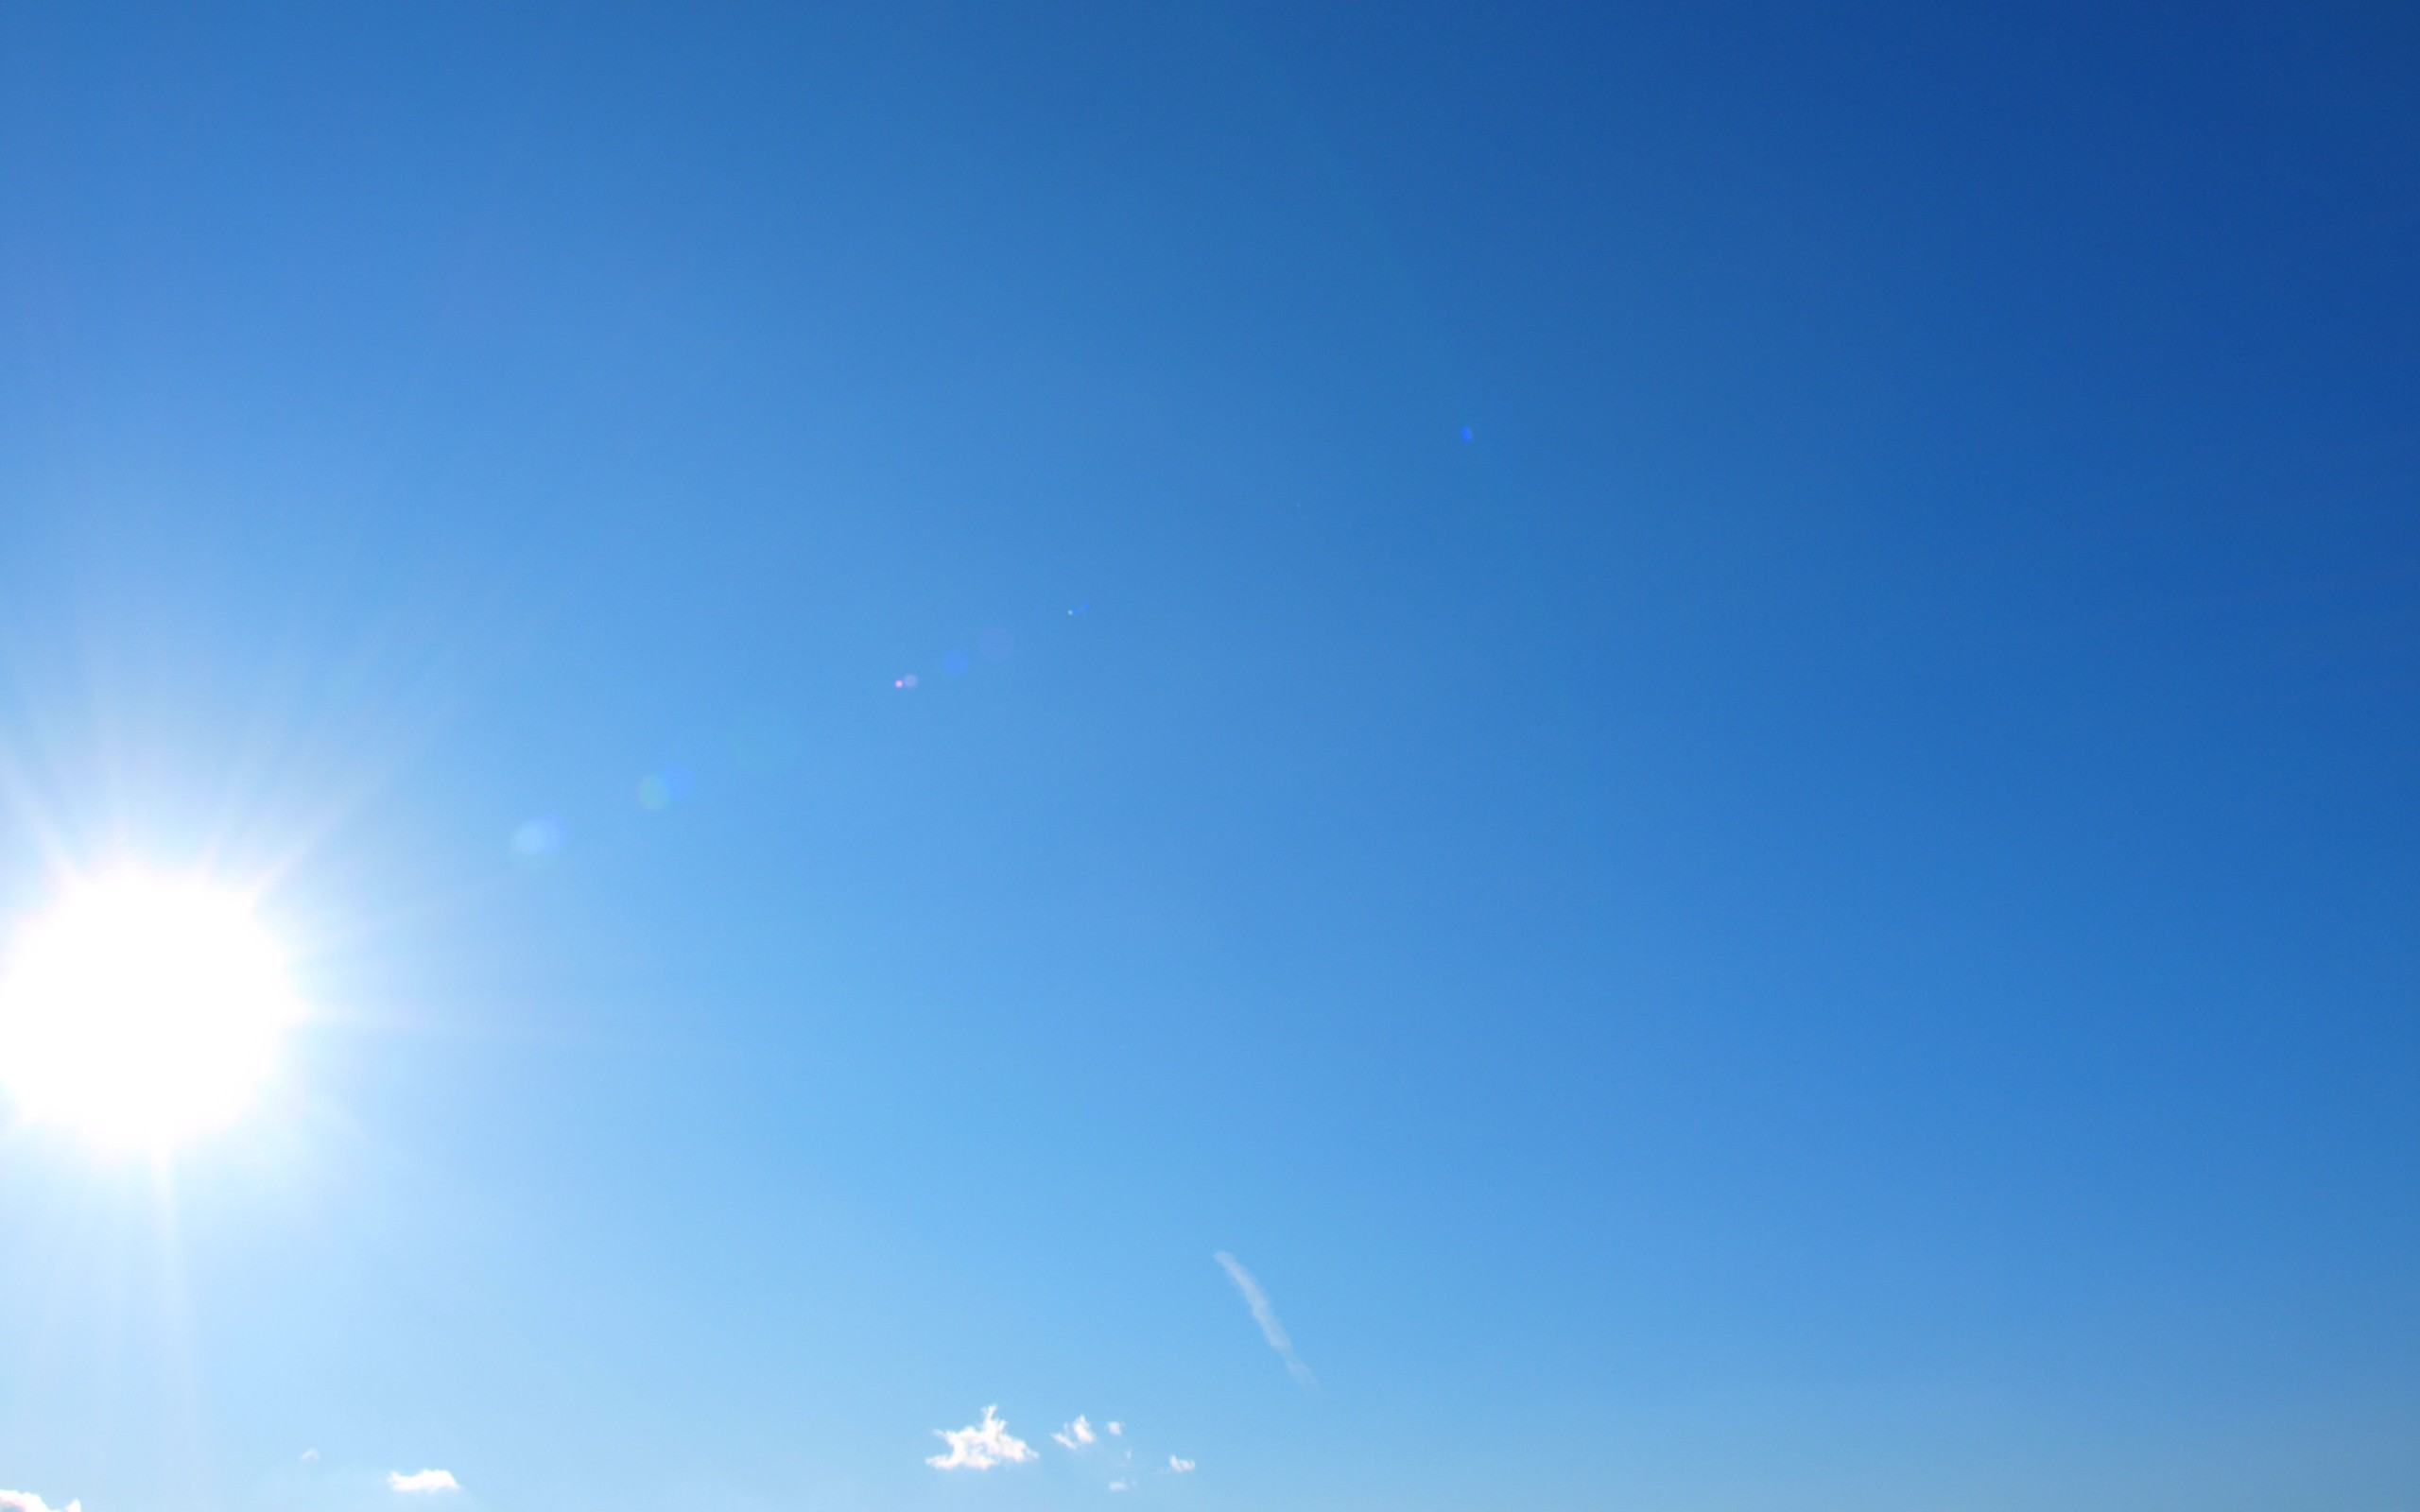 Картинки, картинки чистого неба с солнцем